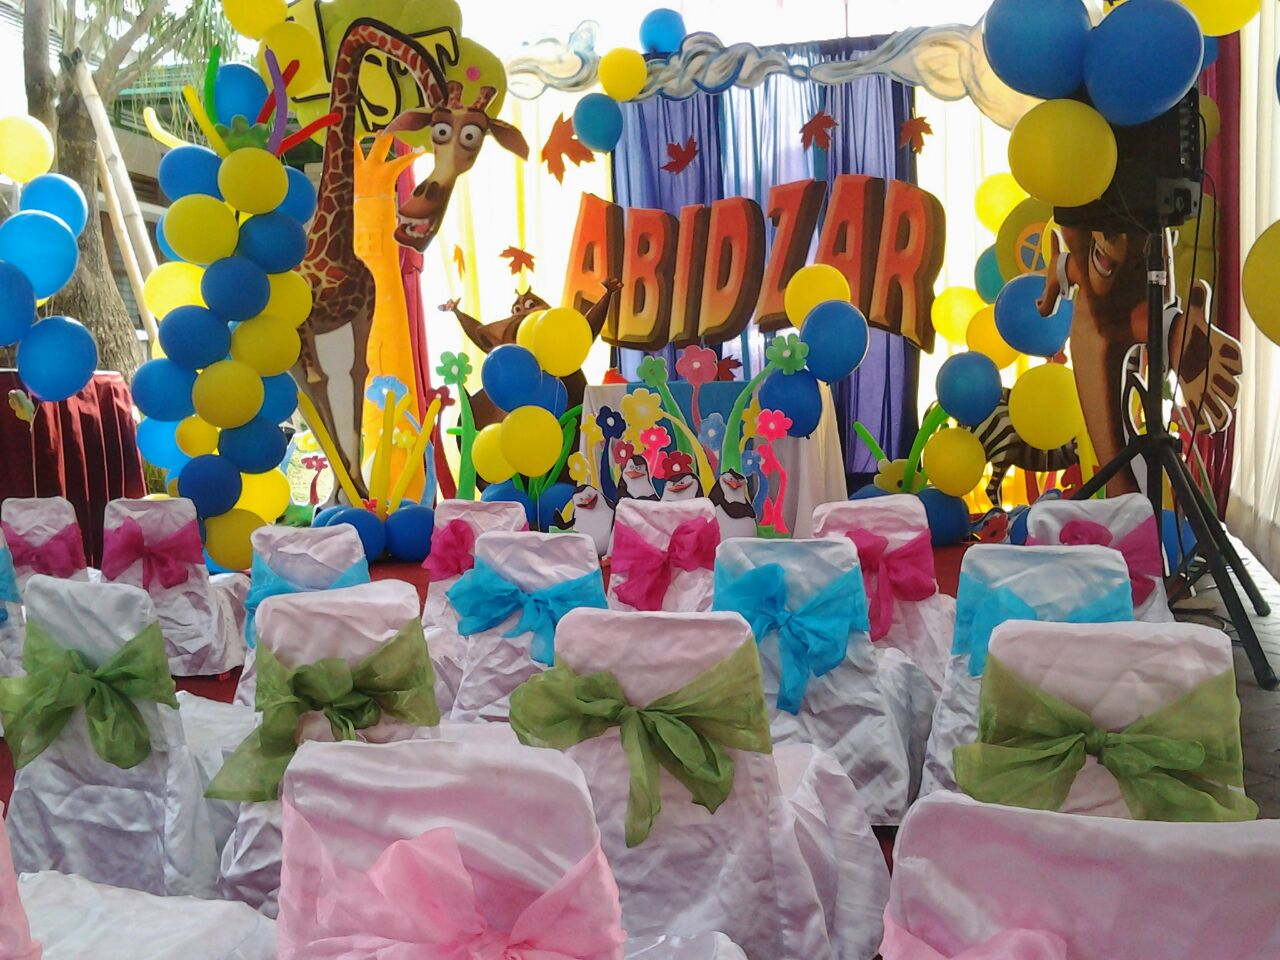 Jasa Dekorasi Ulang Tahun Di Malang